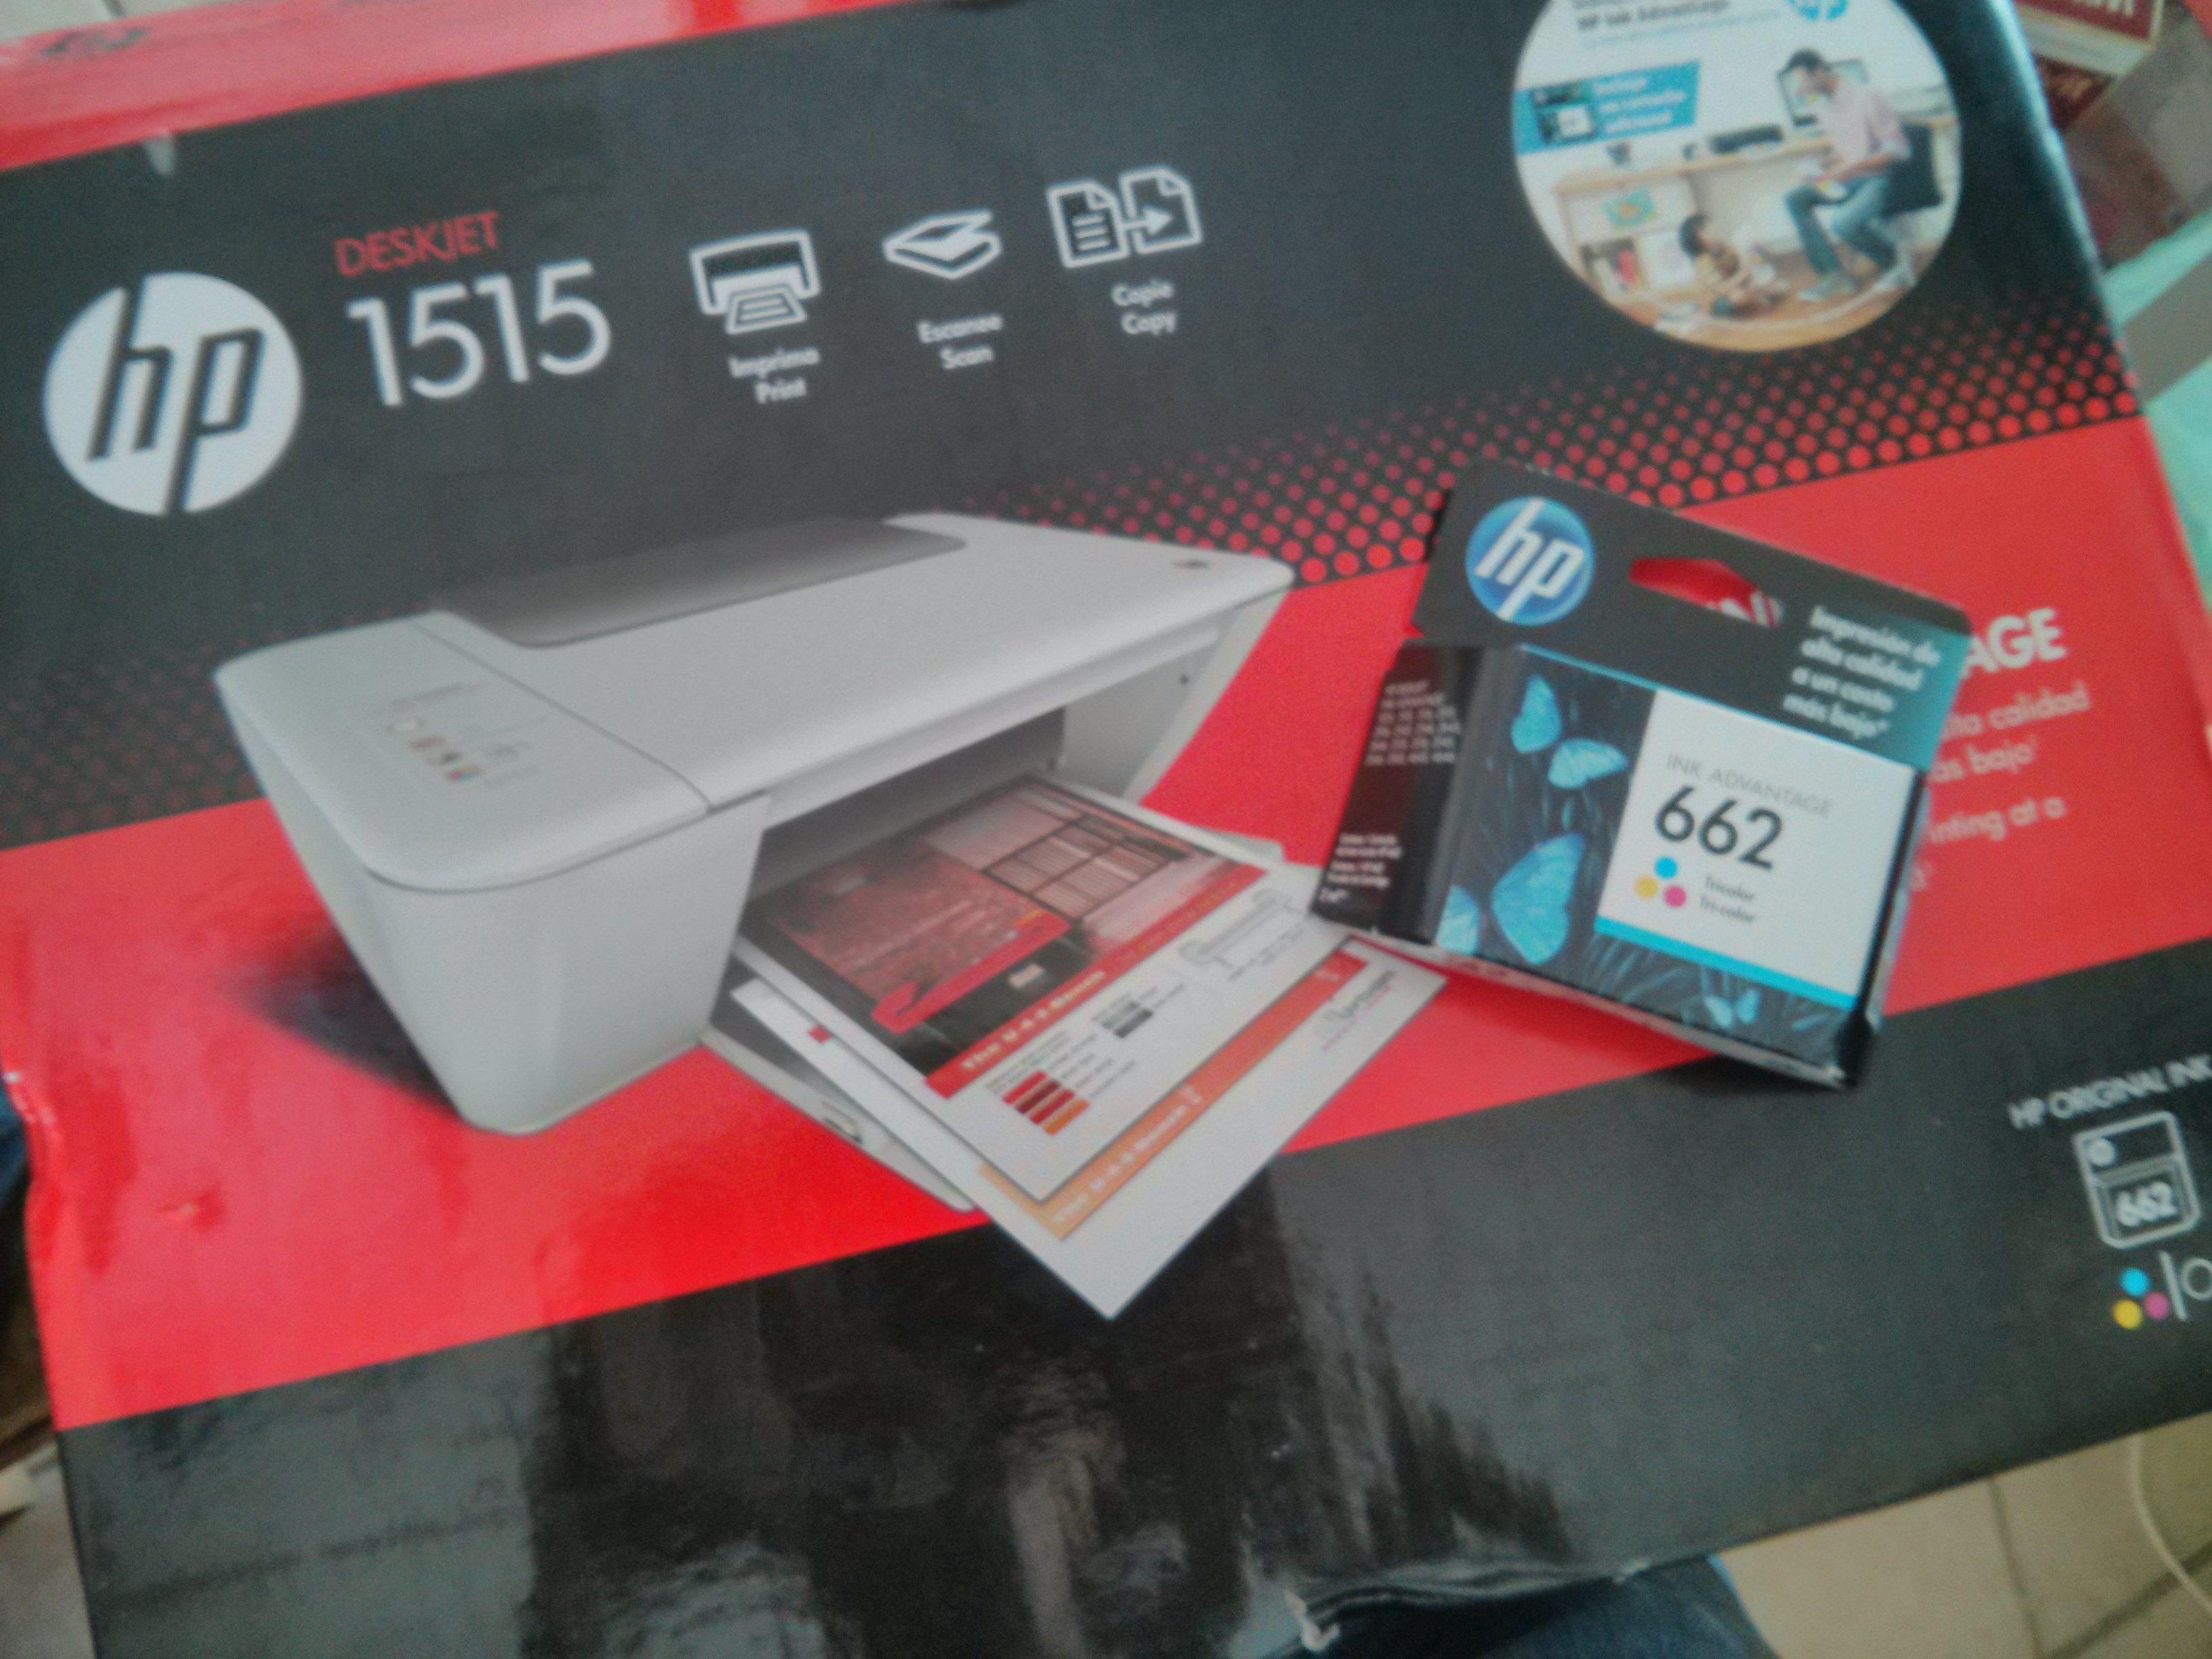 Bodega Aurrerá: impresora HP Deskjet 1515 $690